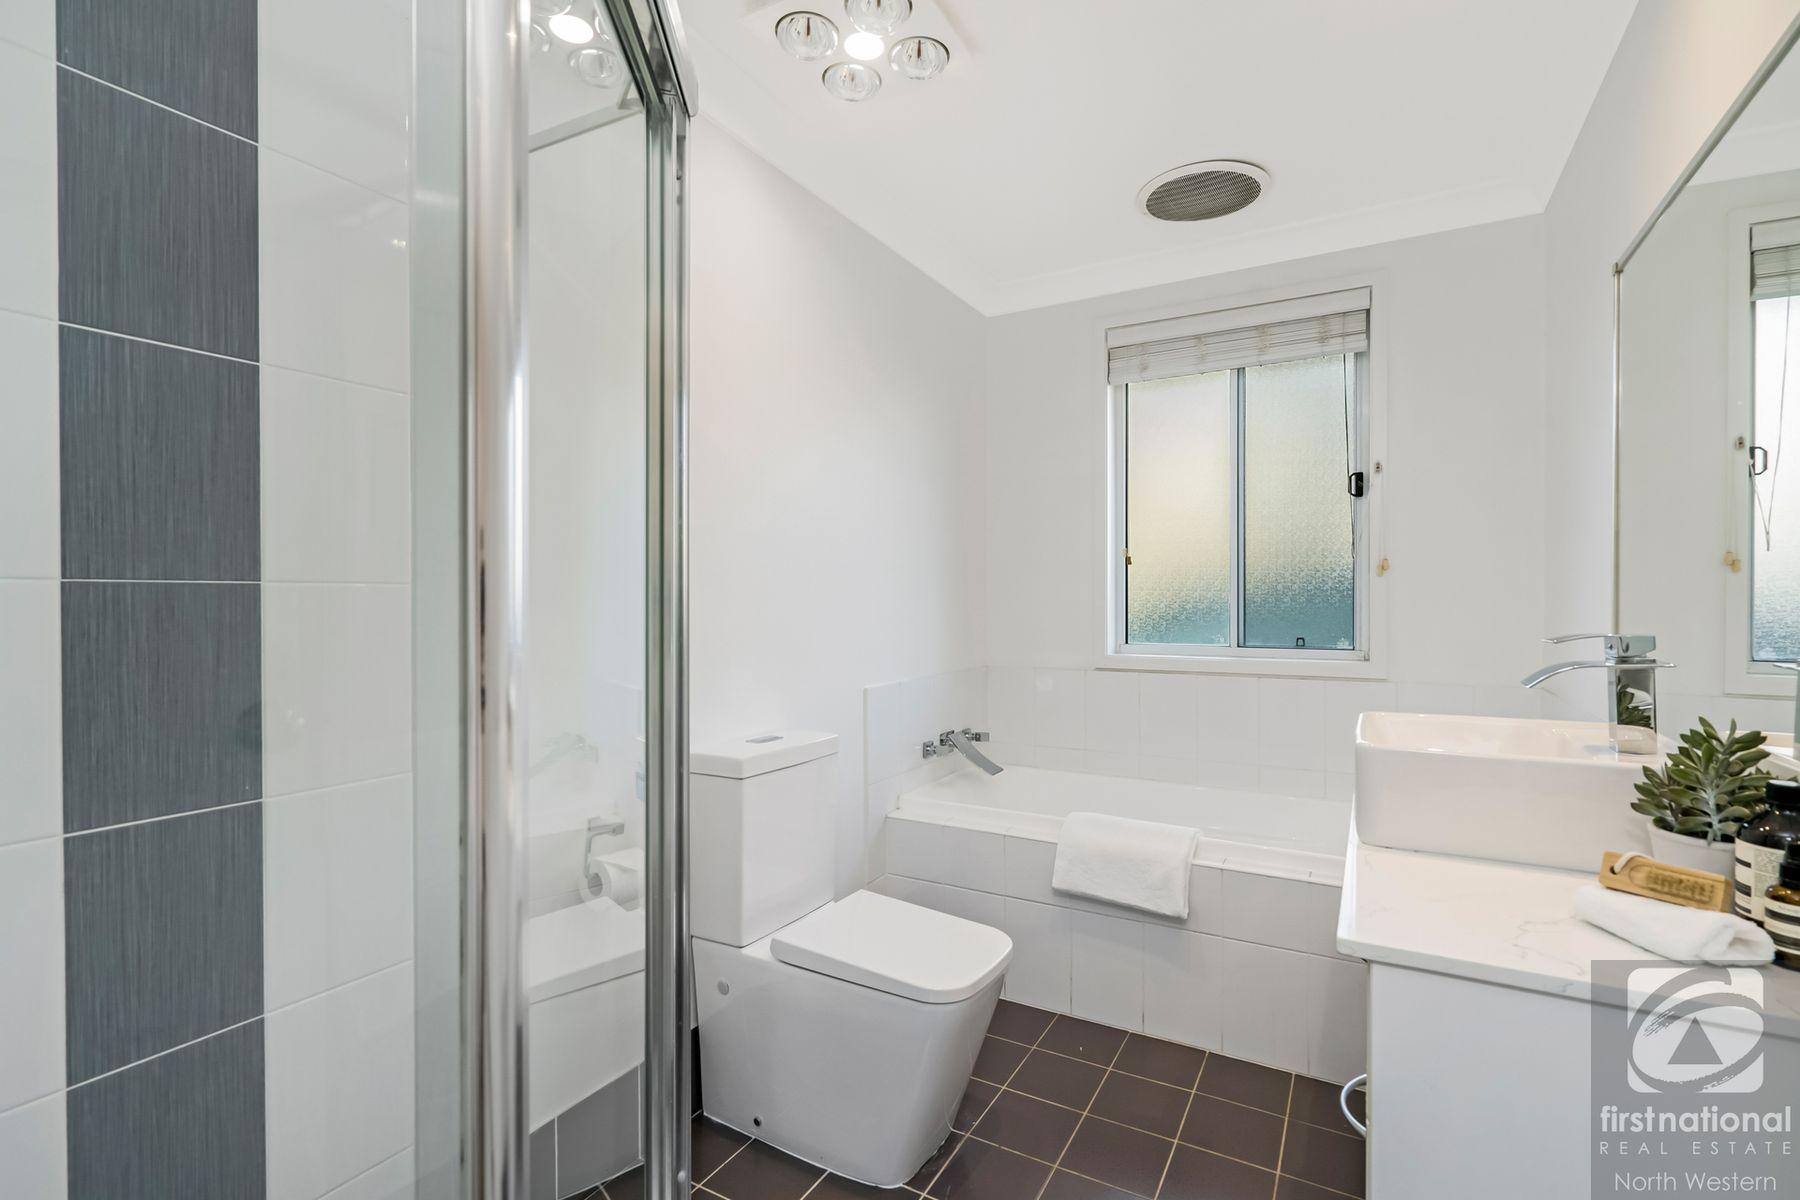 2 Bradforde Street, Kellyville Ridge, NSW 2155